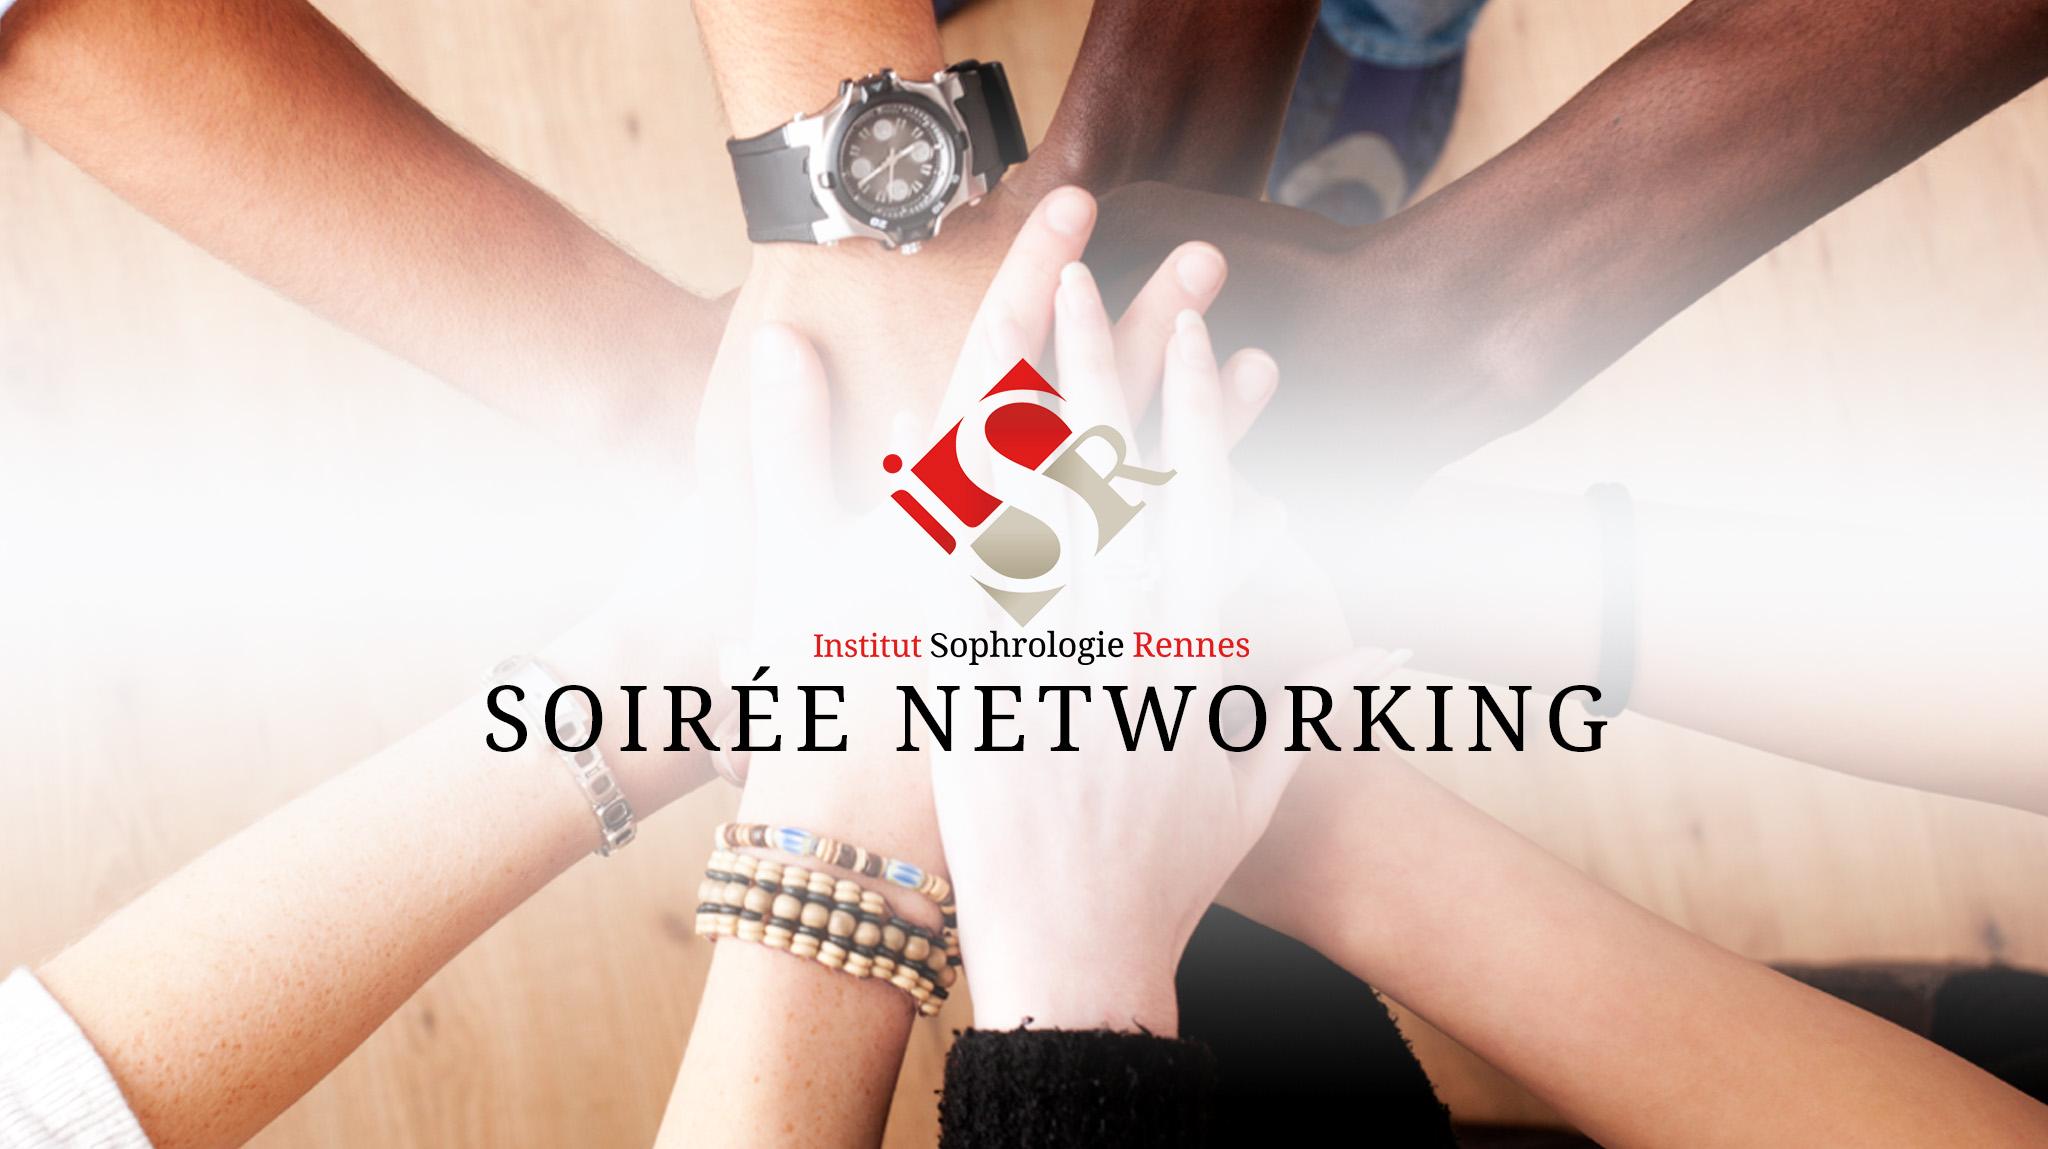 Soirée Networking - ISR